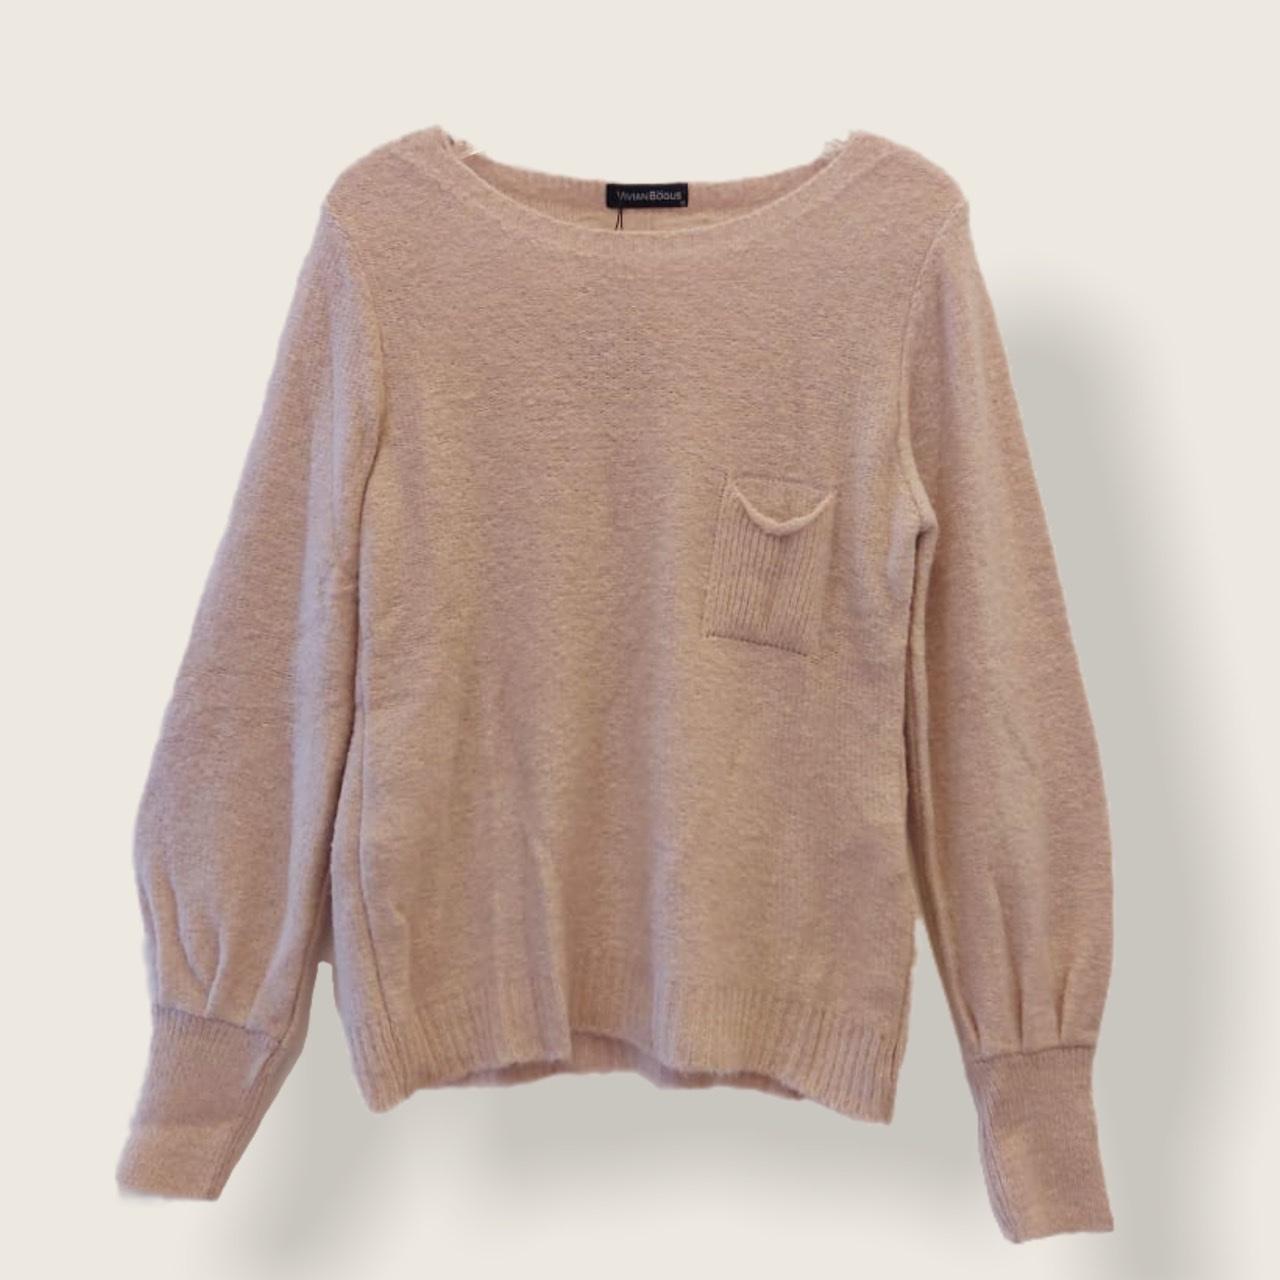 Blusa tricô bolsinho cor rosa claro  - Vivian Bógus